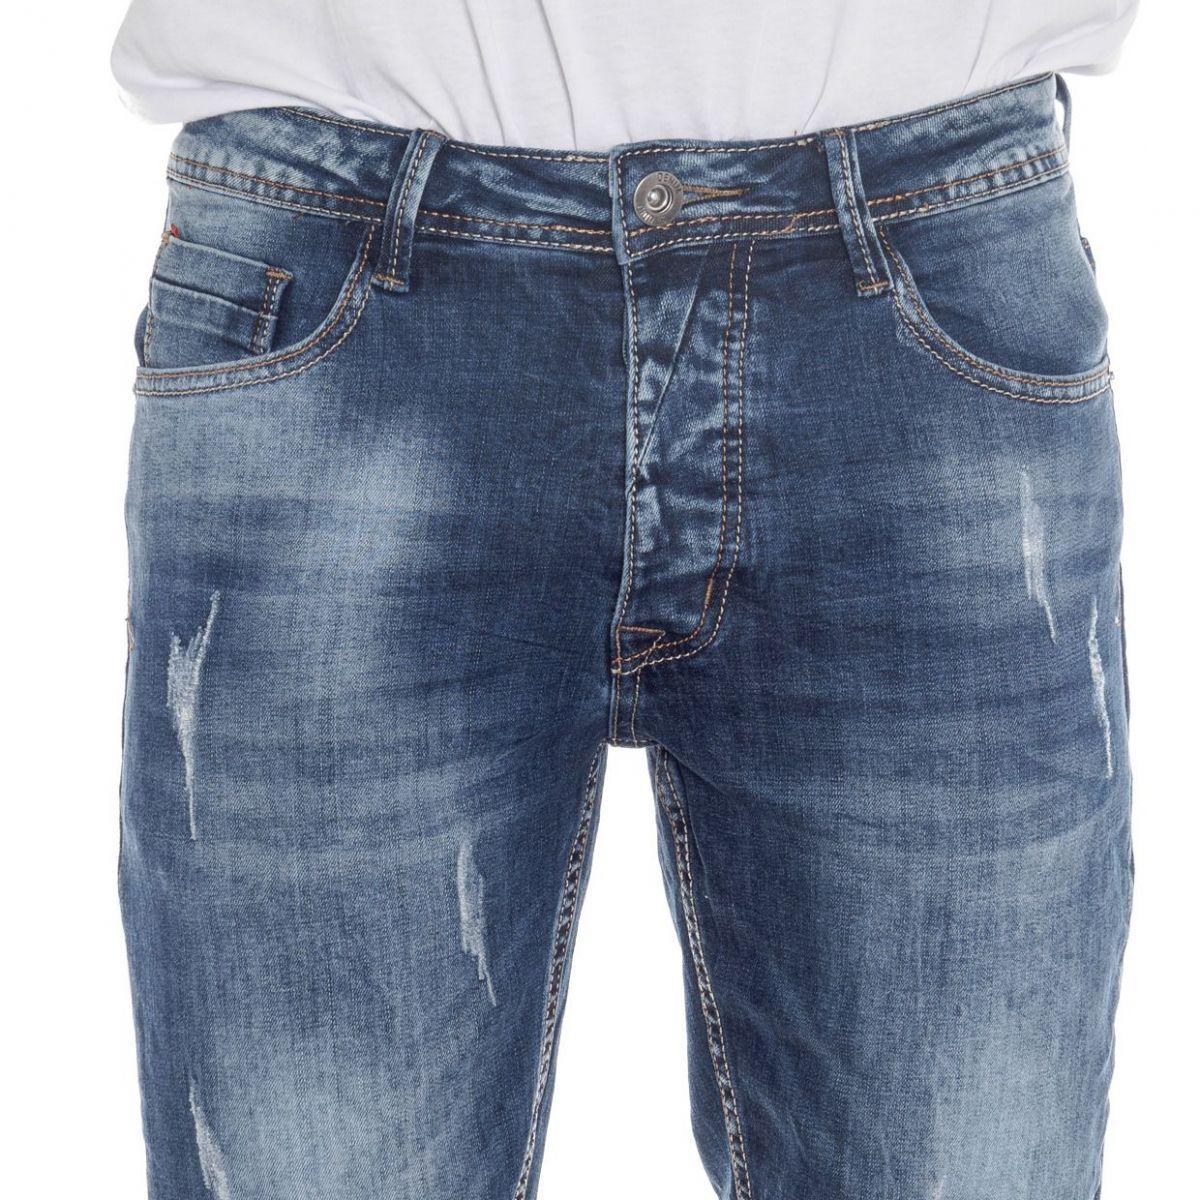 sconti abbigliamento uomo Bermuda LPHM1057 BLU Cafedelmar Shop